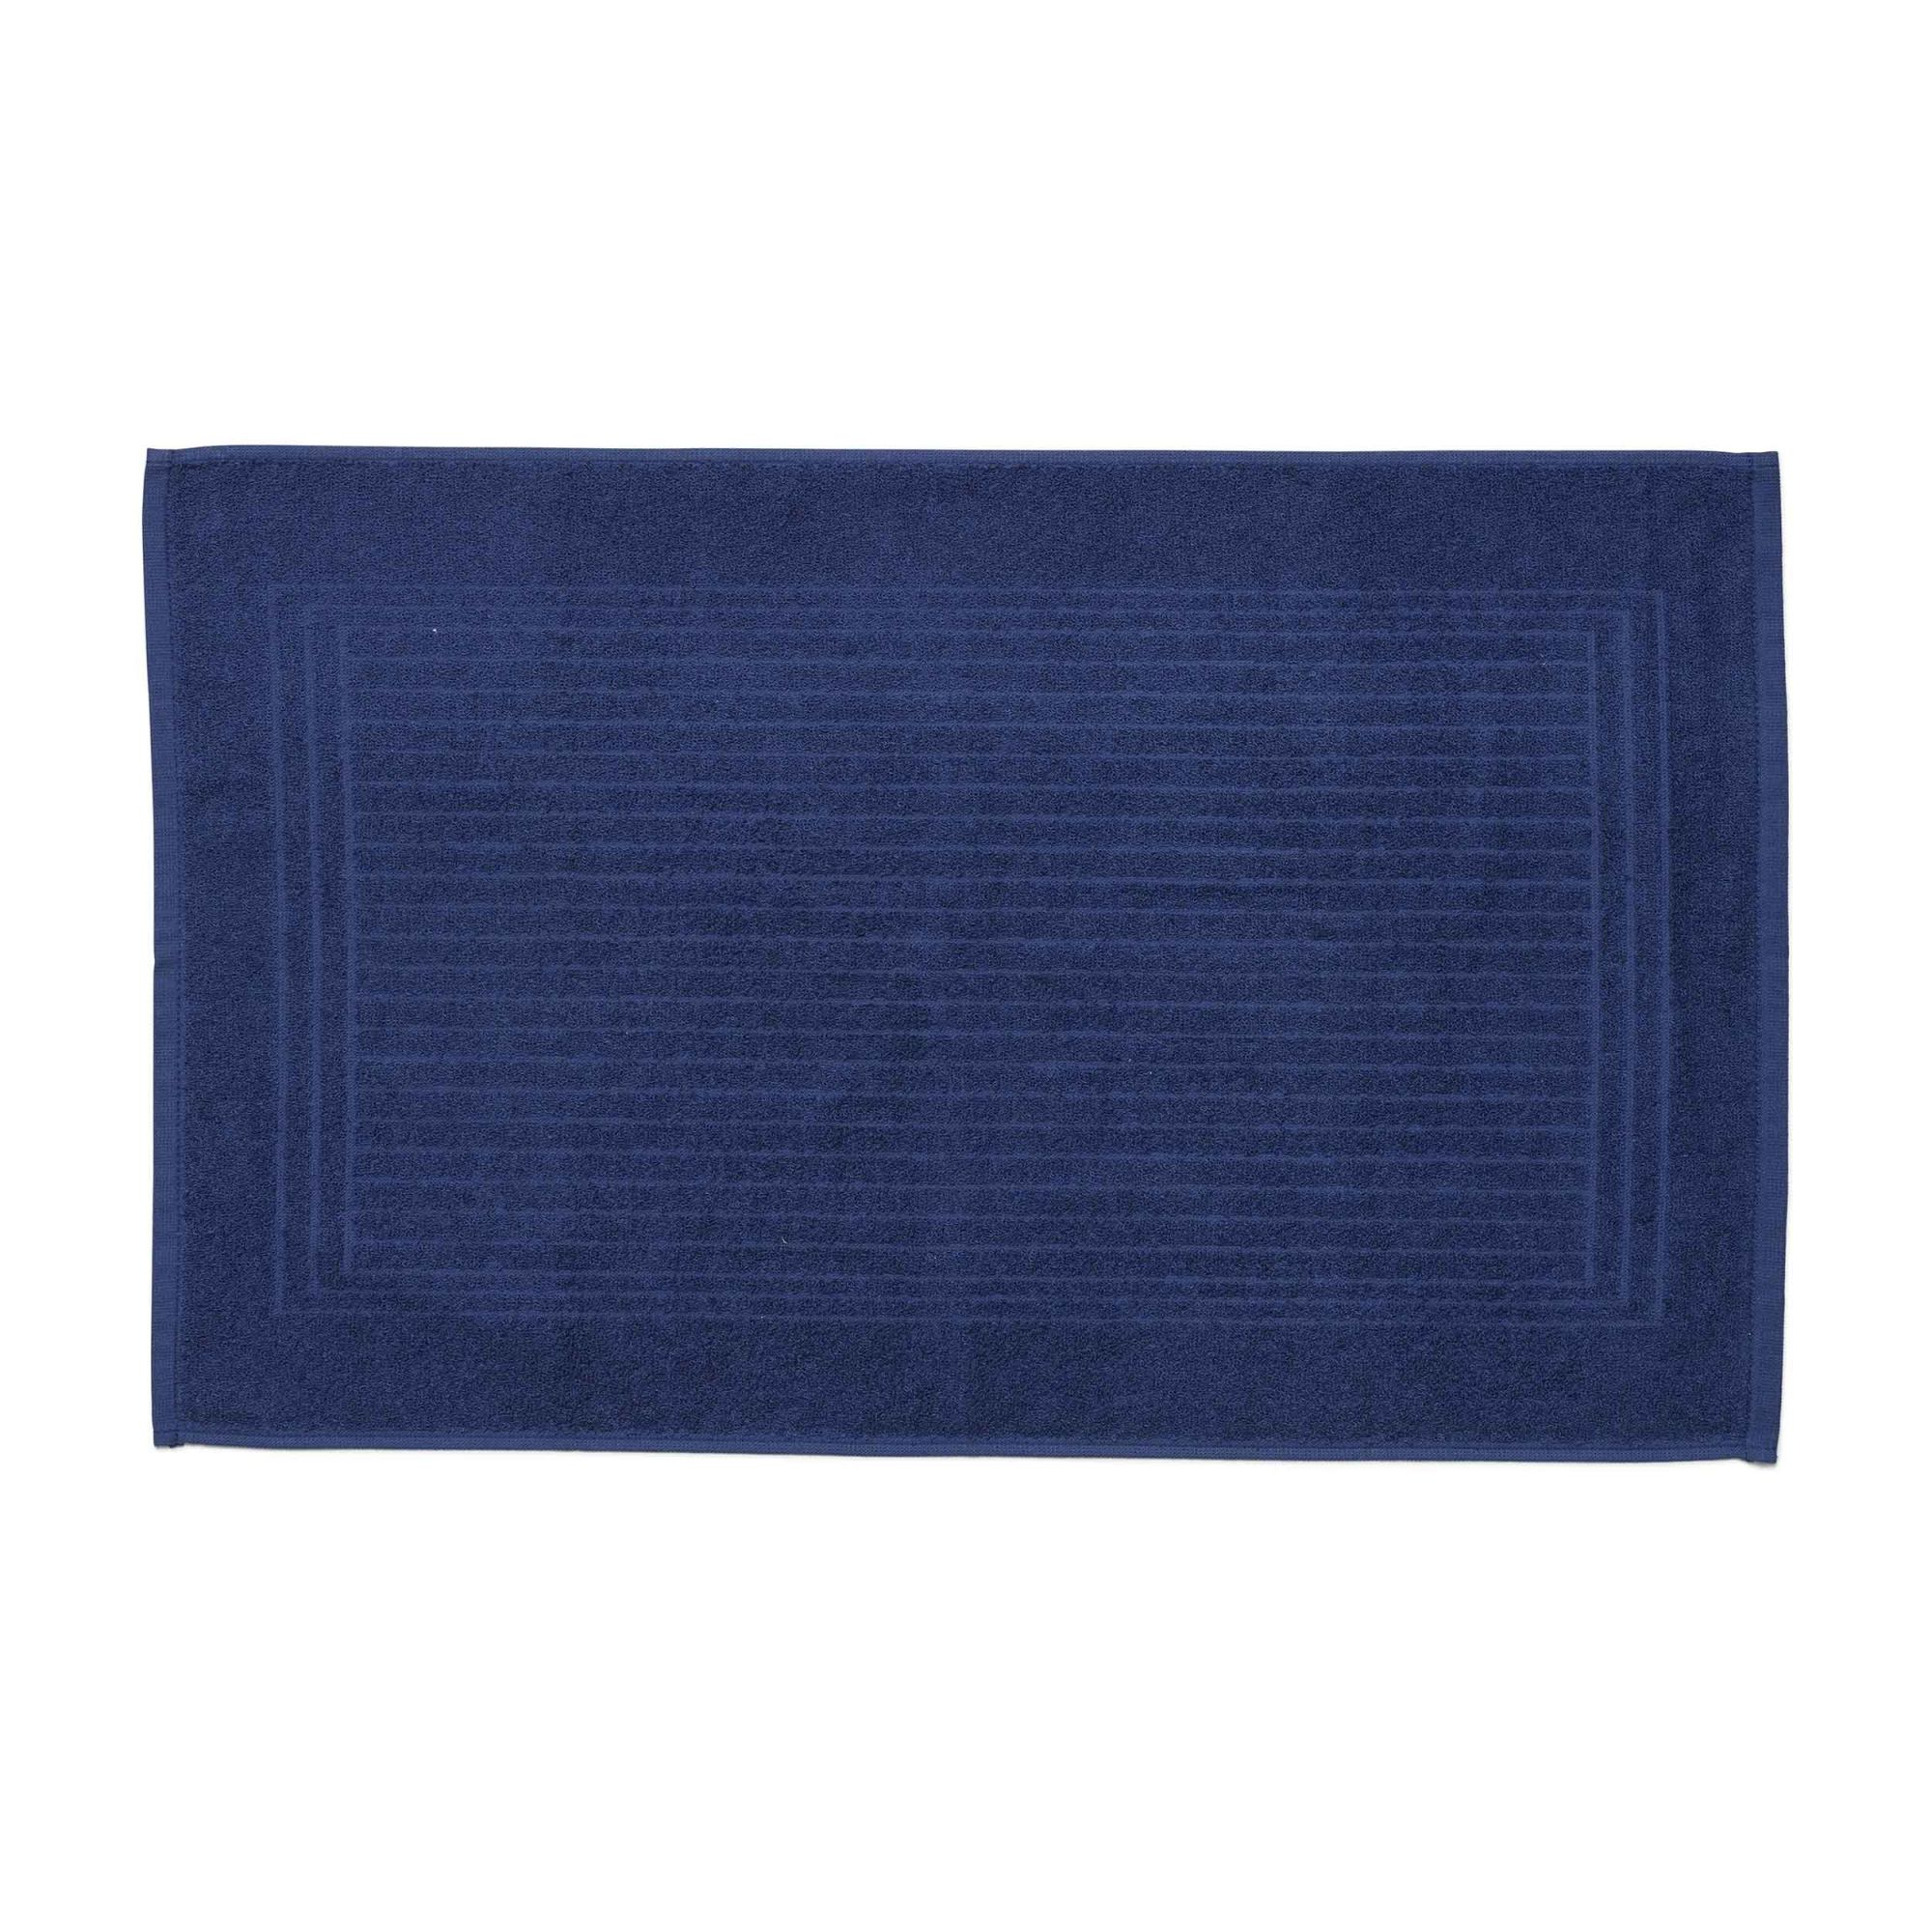 Piso cedro santista azul marinho 100% algodao